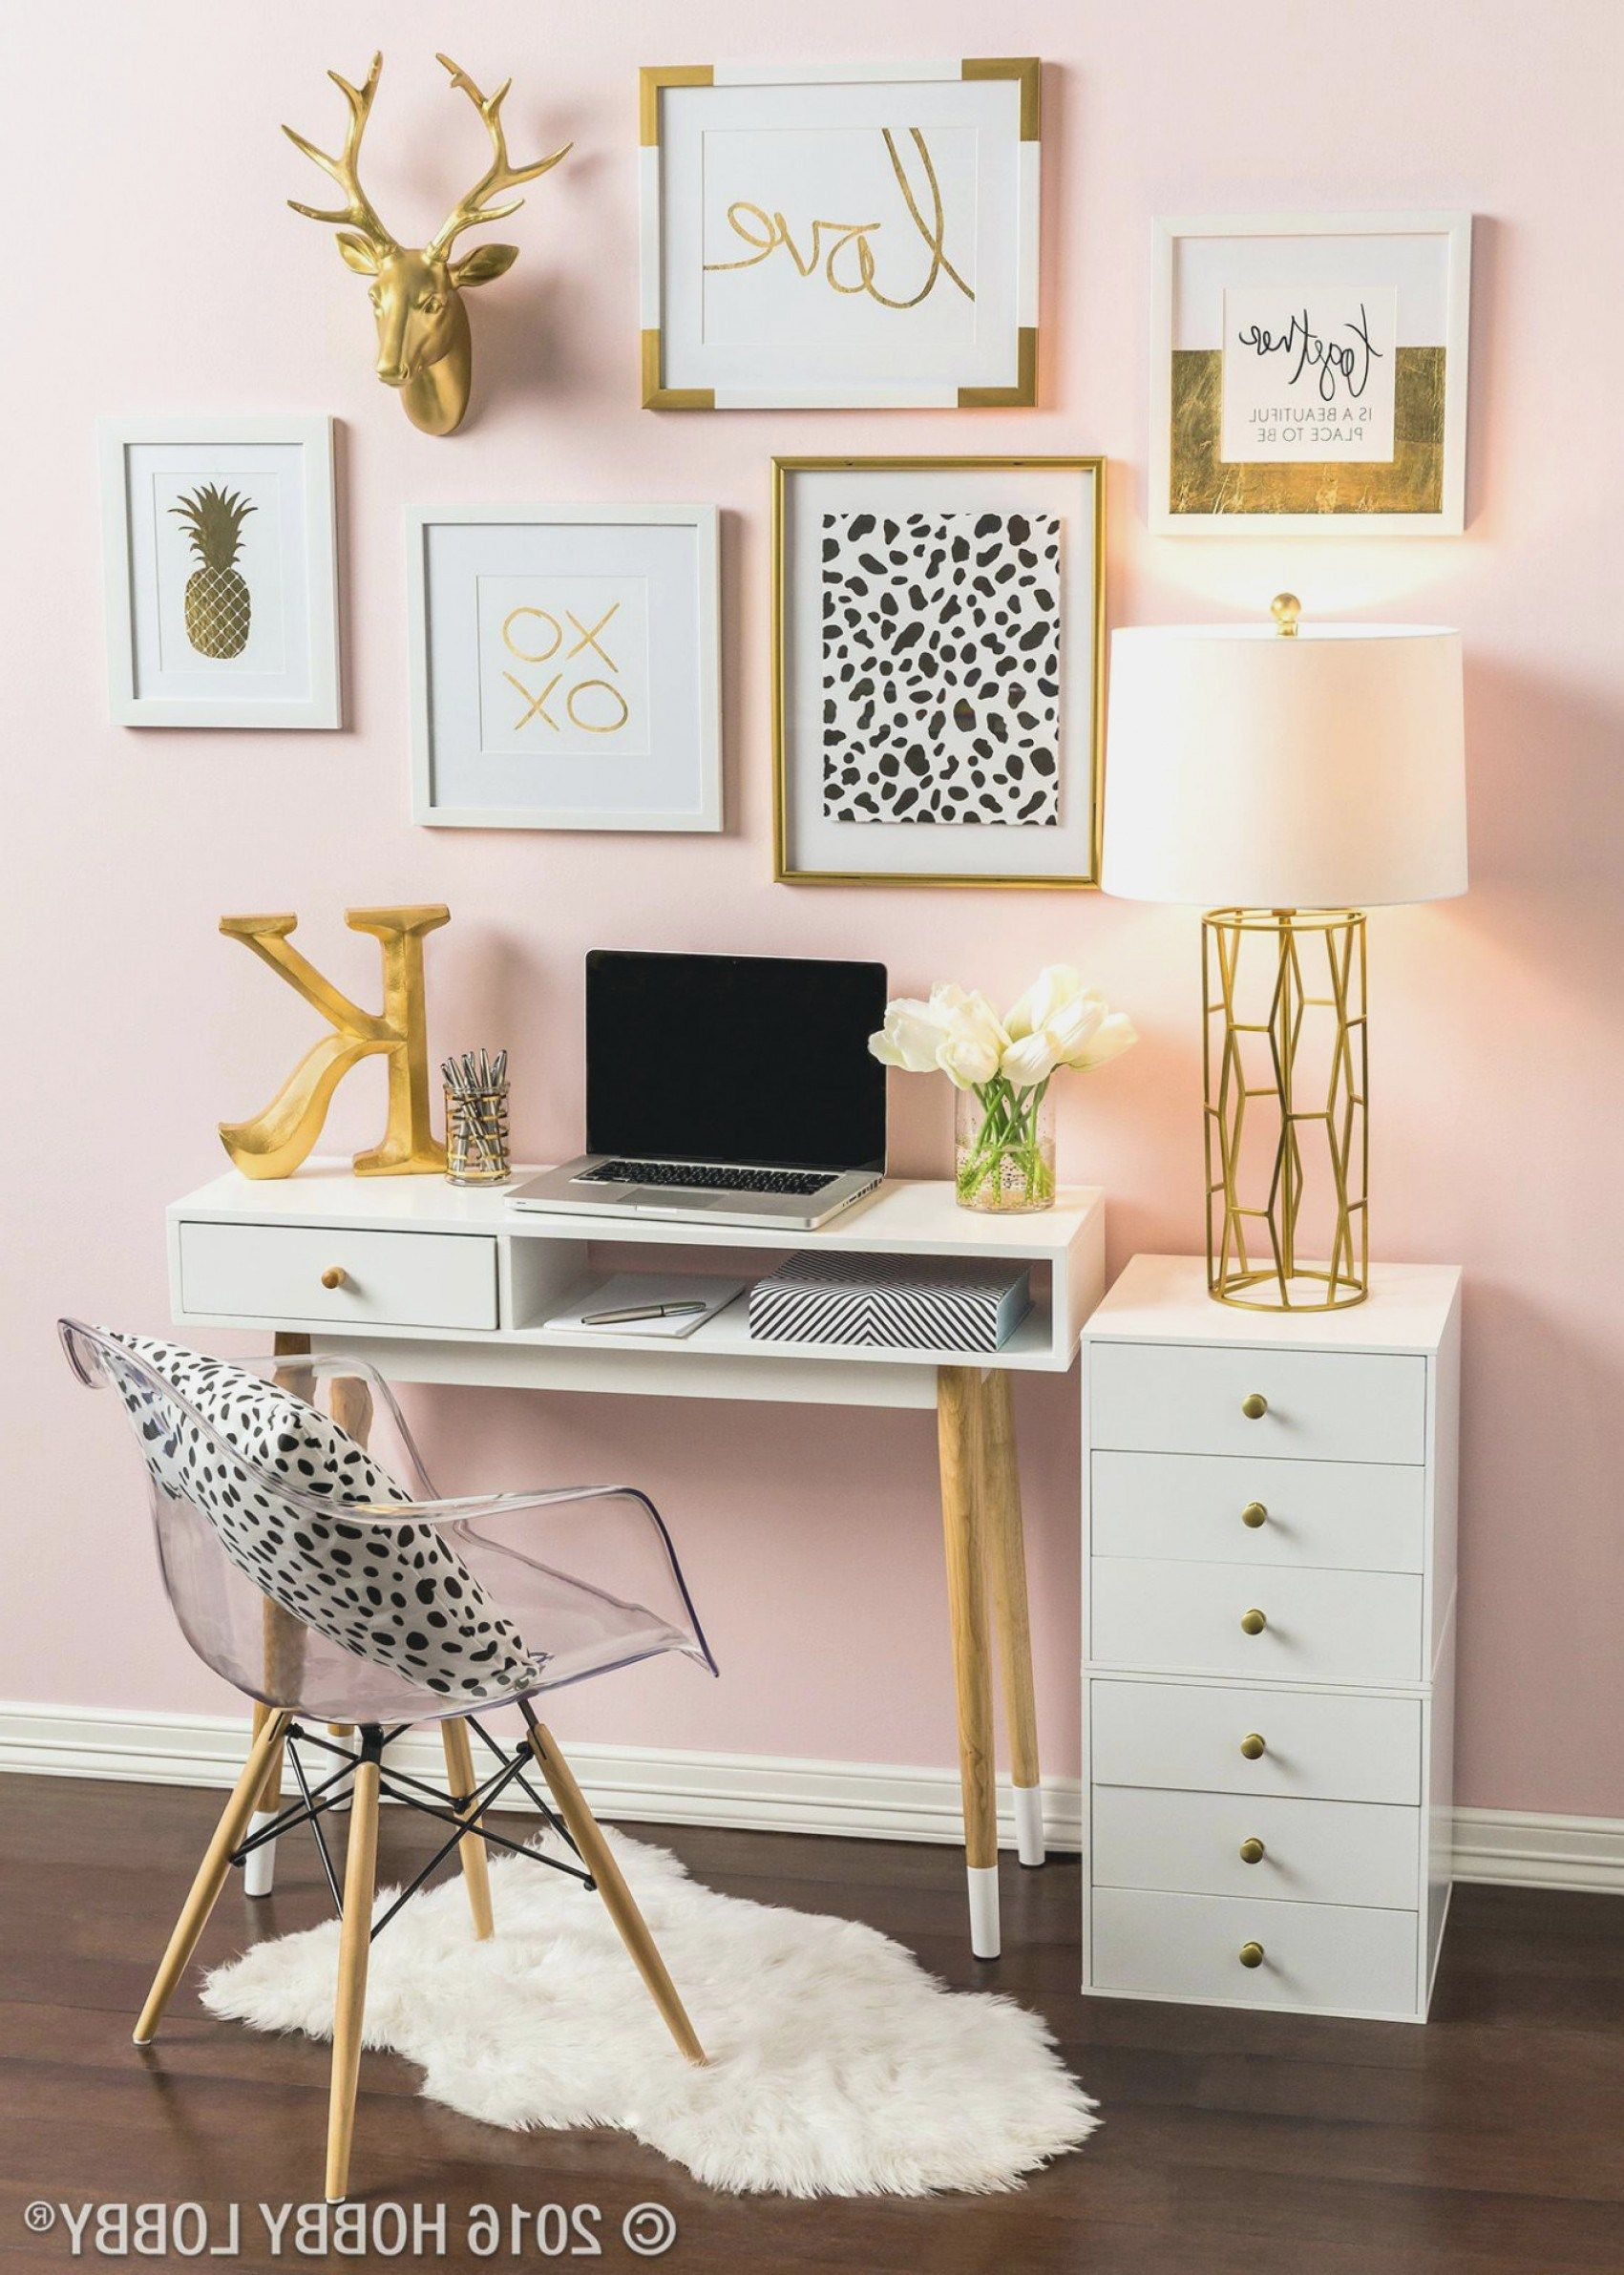 Cute Office Decorations Beautiful Bedroom Decor Home Office Decor Dorm Room Decor